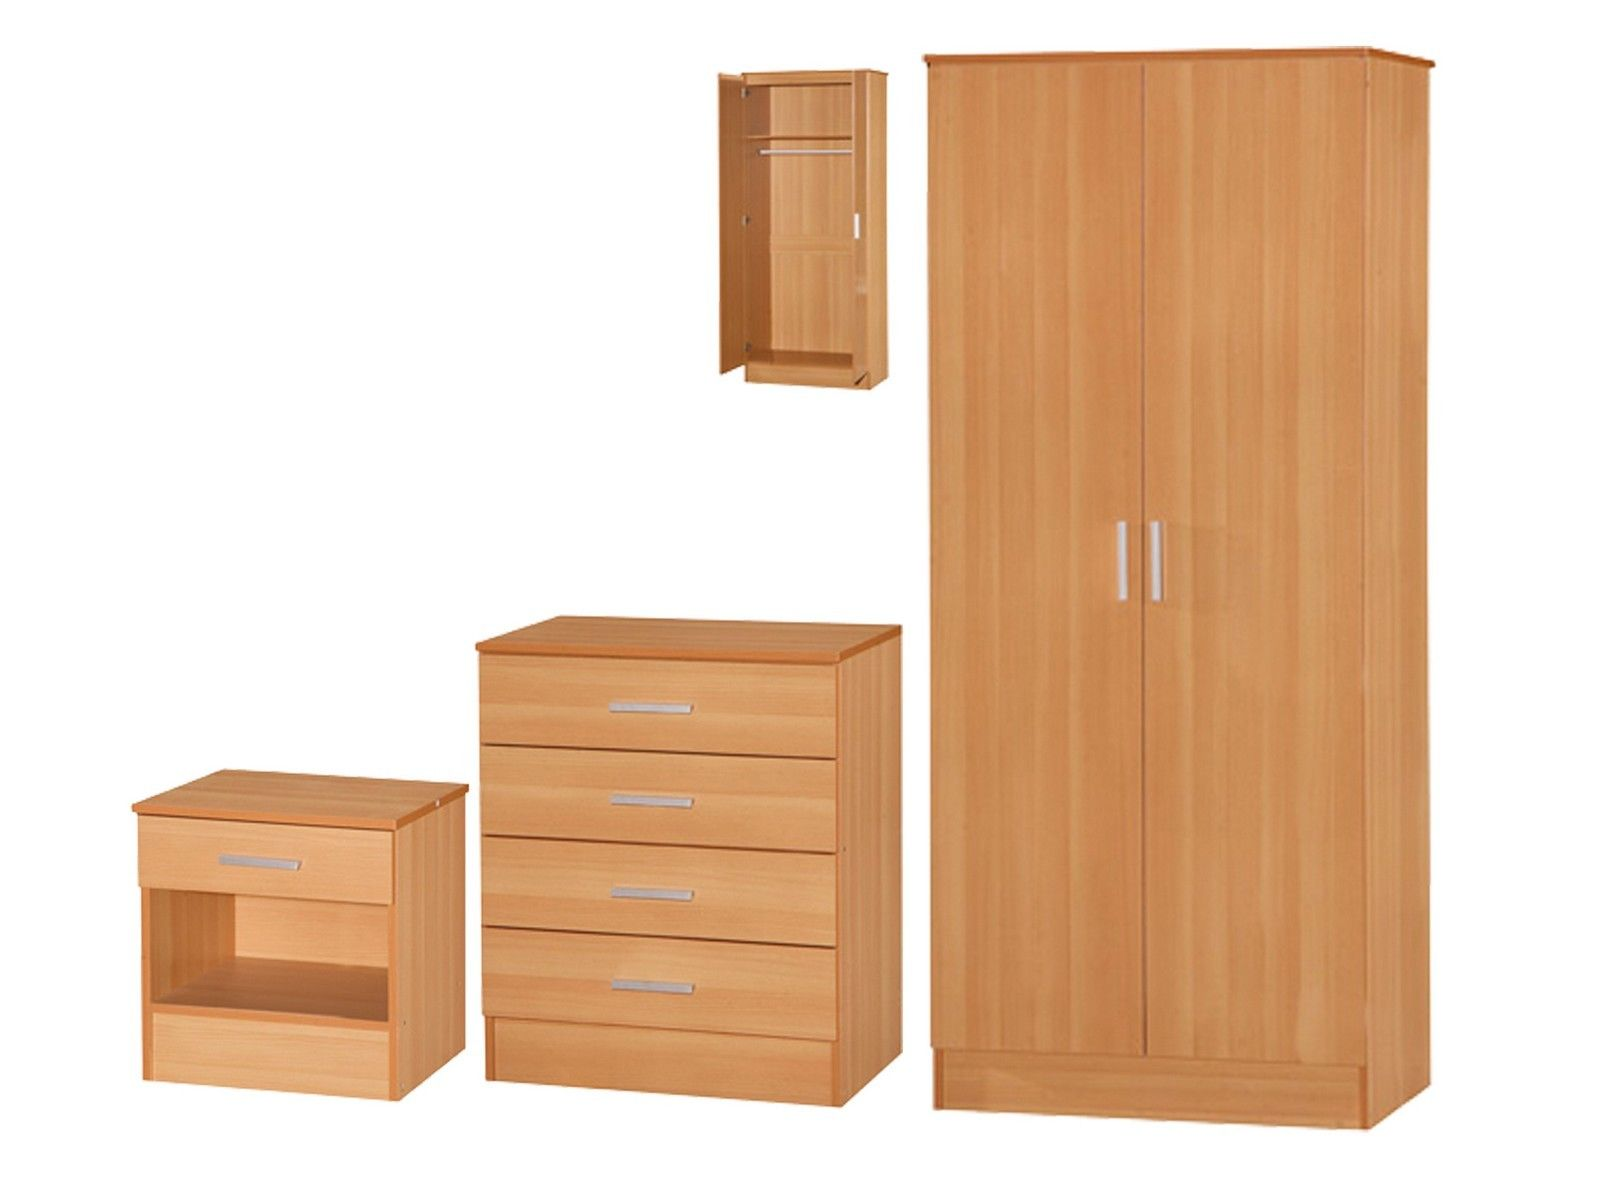 Galaxy beech bedroom furniture set 3 piece wardrobe for Beech bedroom furniture